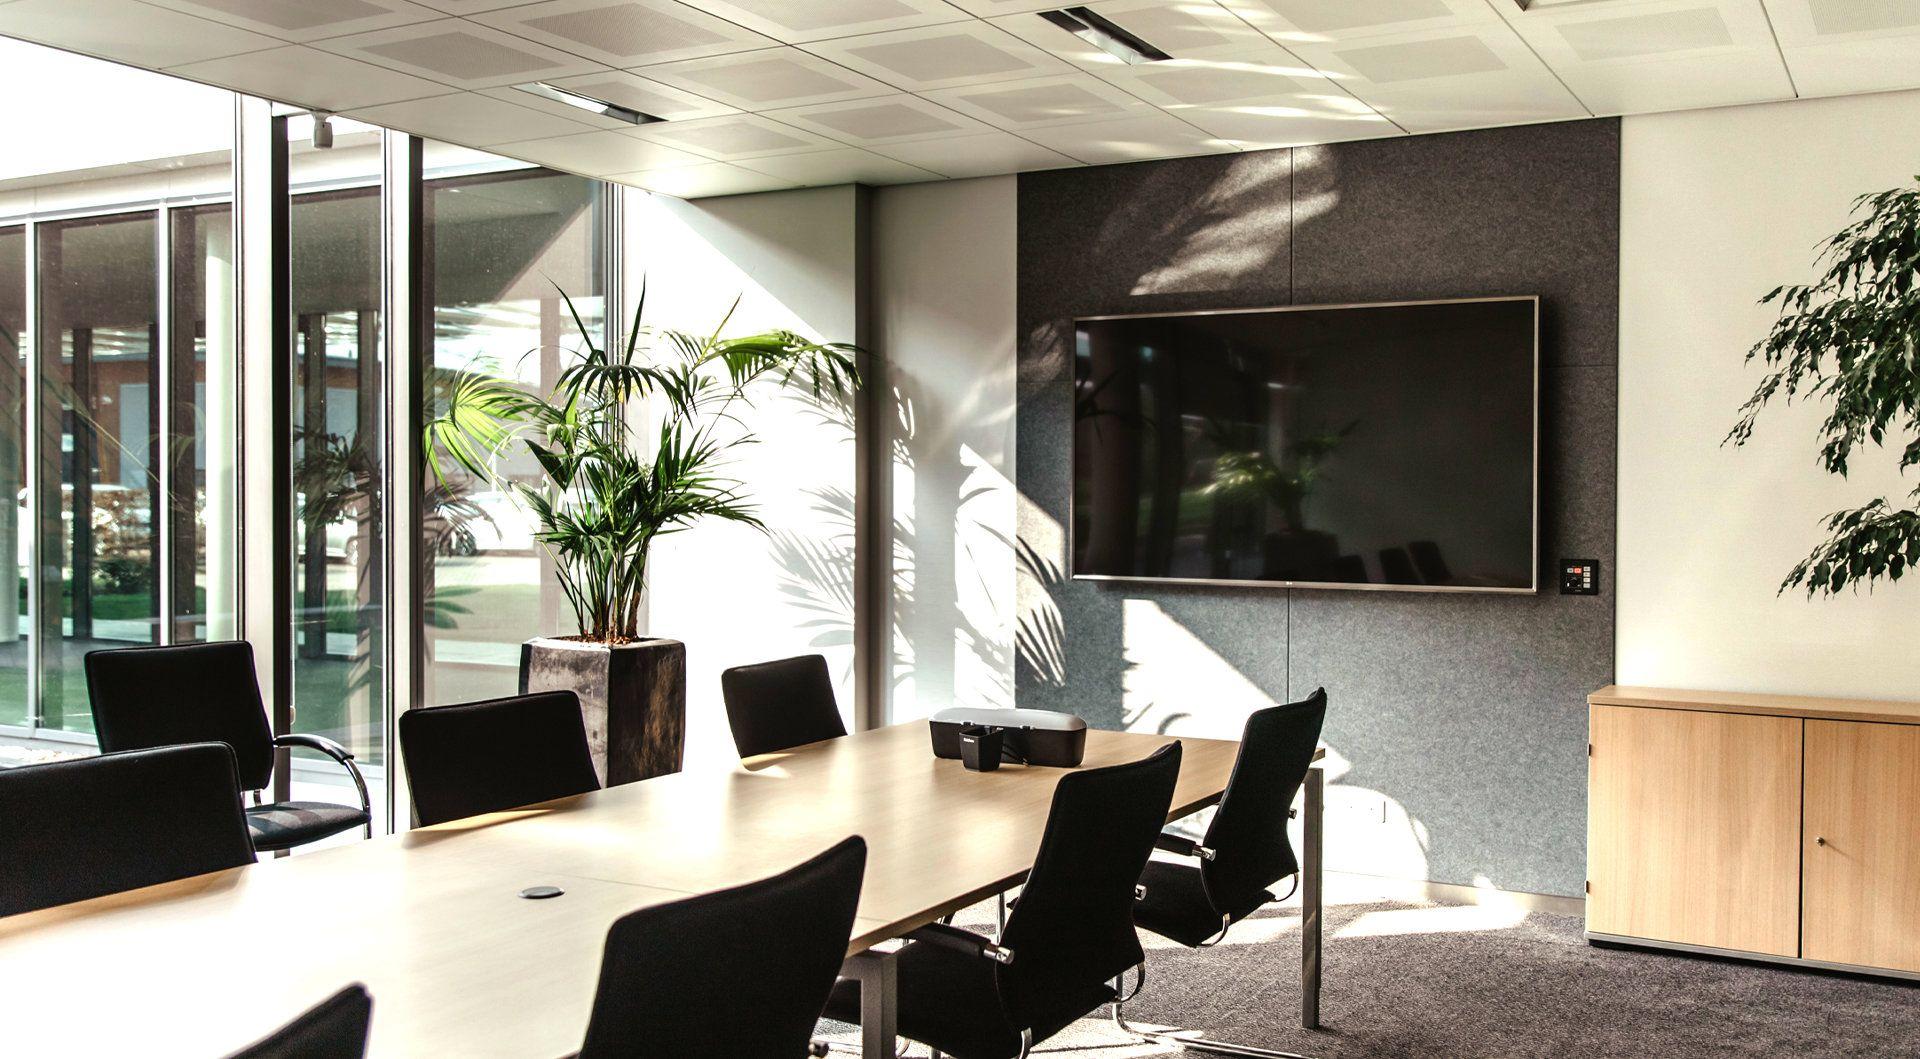 Benq LW820ST beamer/projector Desktopprojector 3600 ANSI lumens DLP WXGA (1280x800) Wit - Case studie de vries